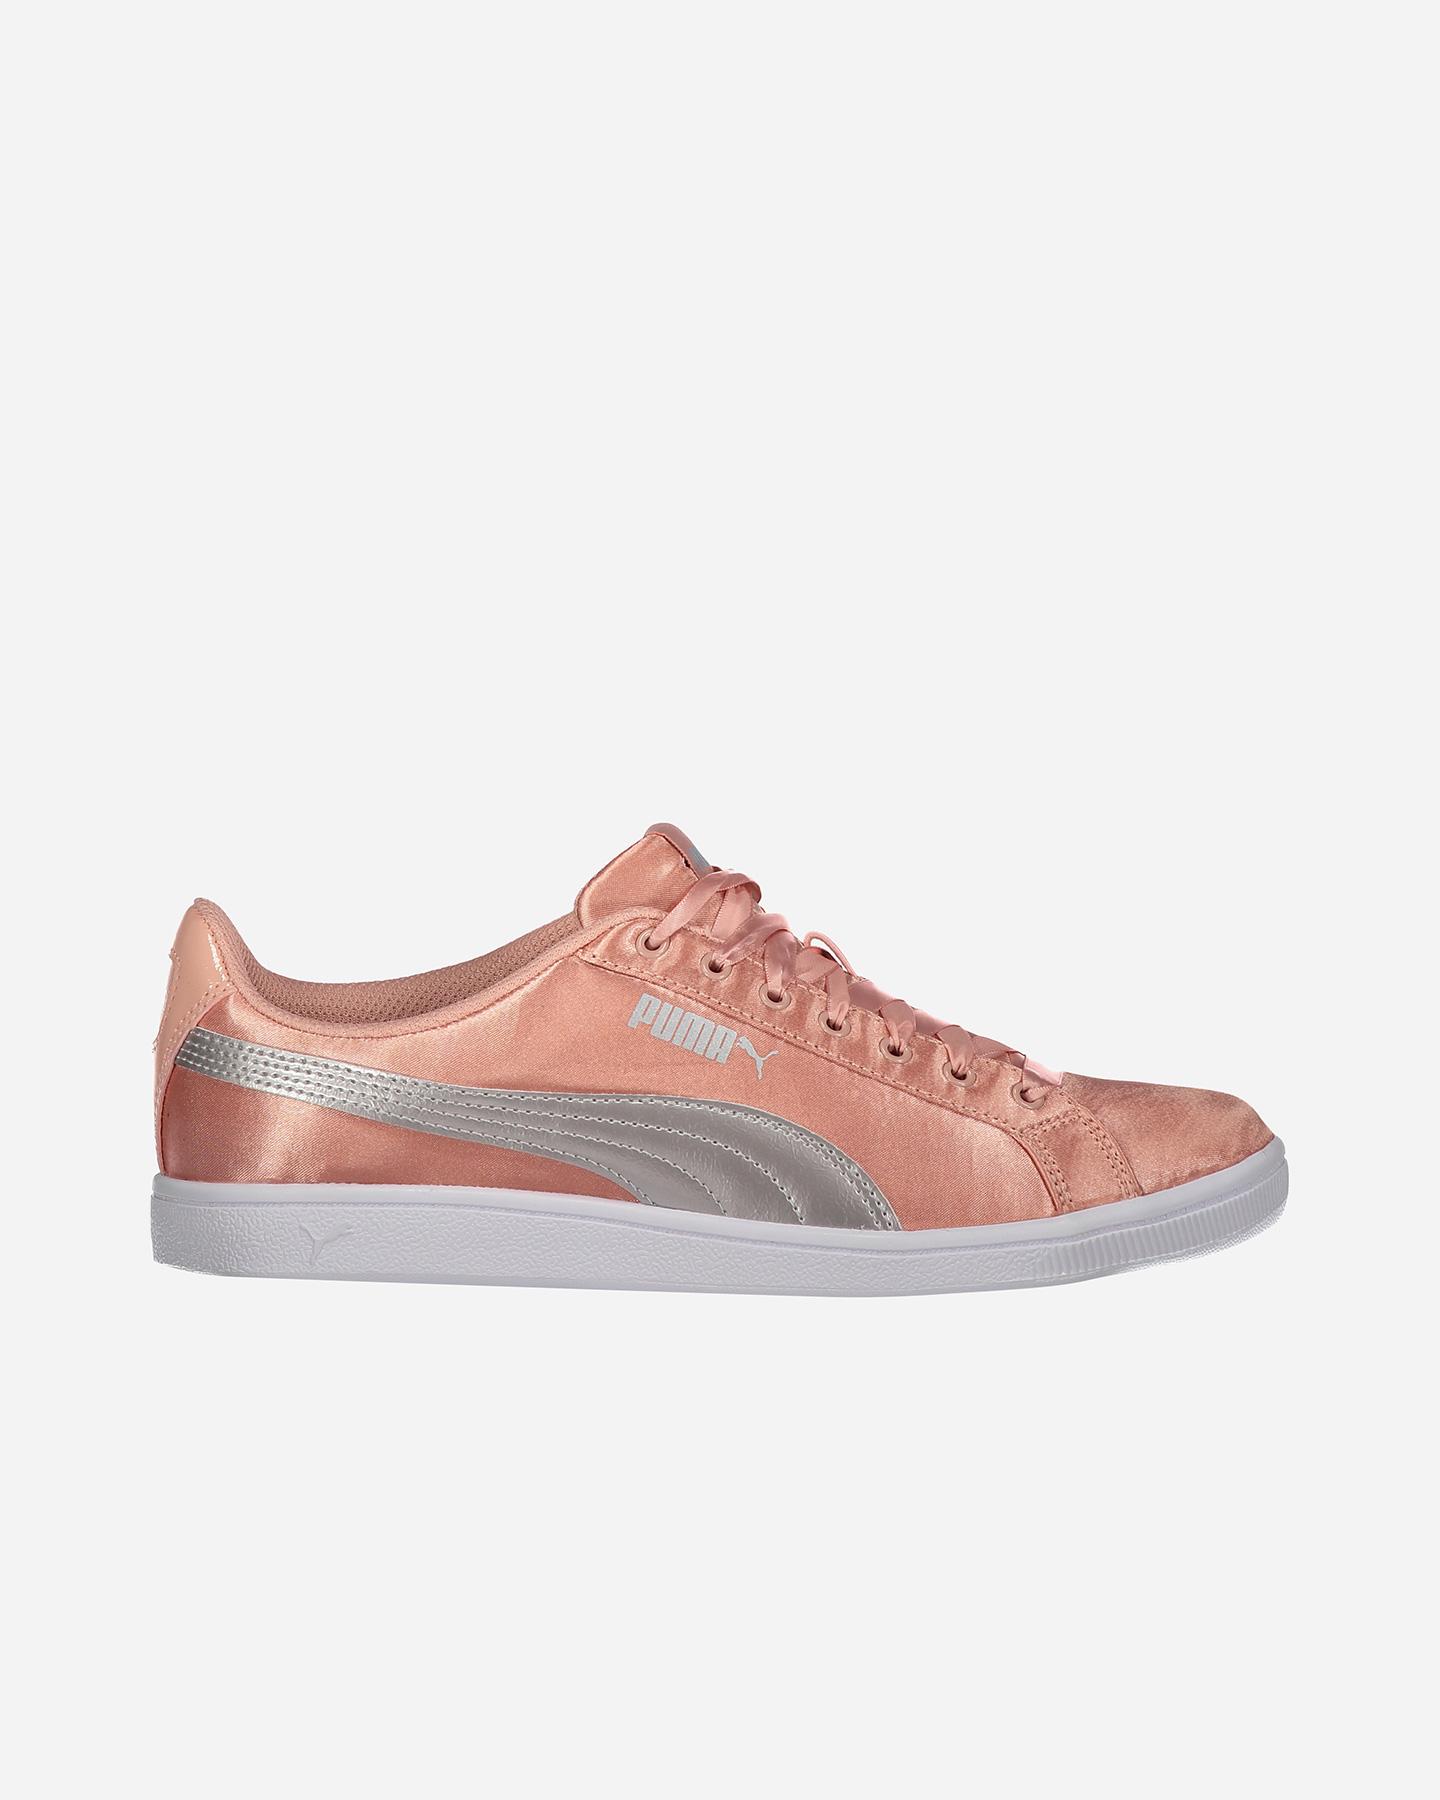 Scarpe 366456 Sport 001 Pointe Sneakers W Puma Vikky Su En Cisalfa pqAZFT